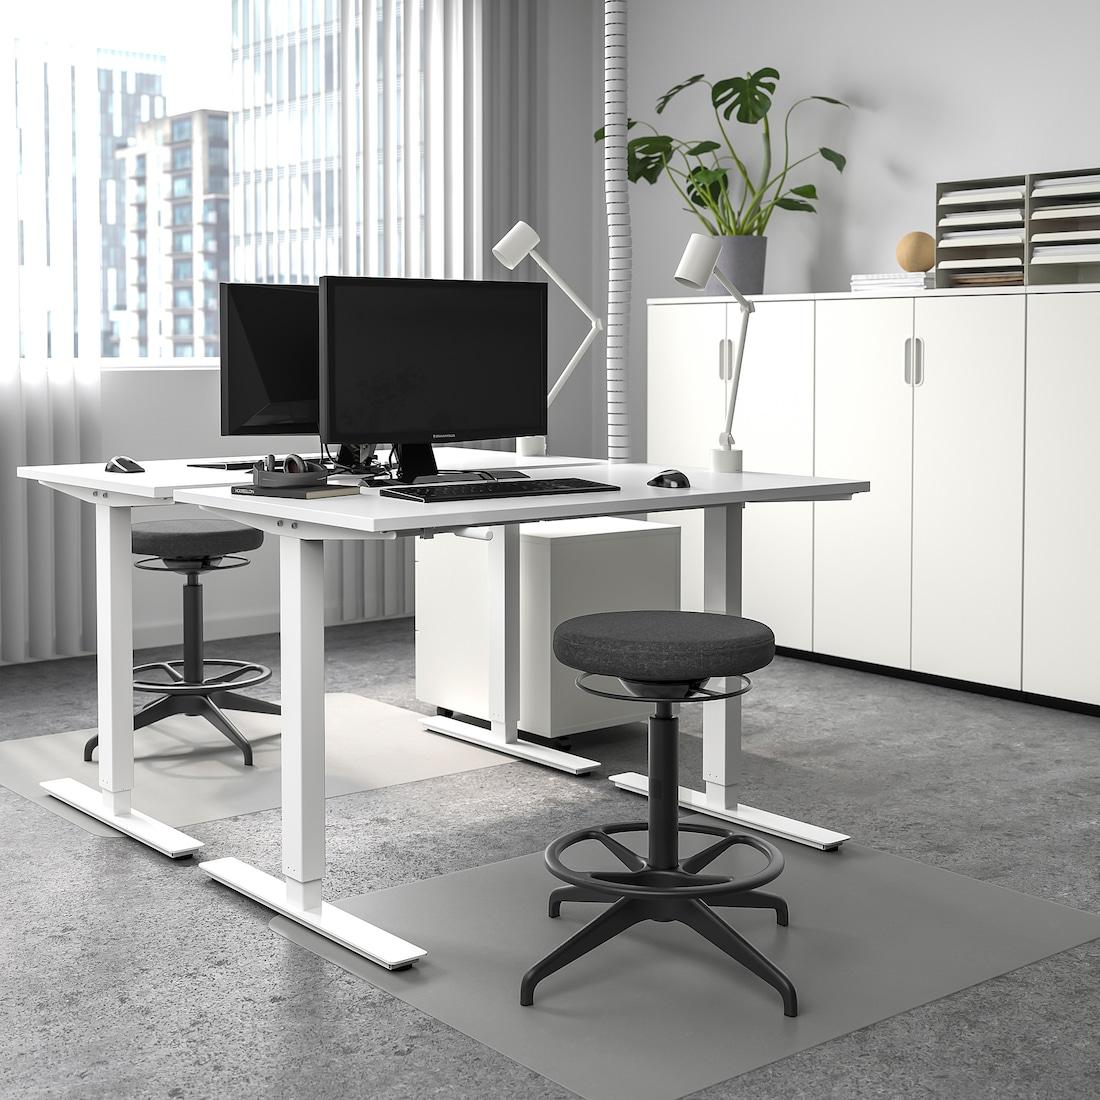 Ikea SKARSTA 升降桌